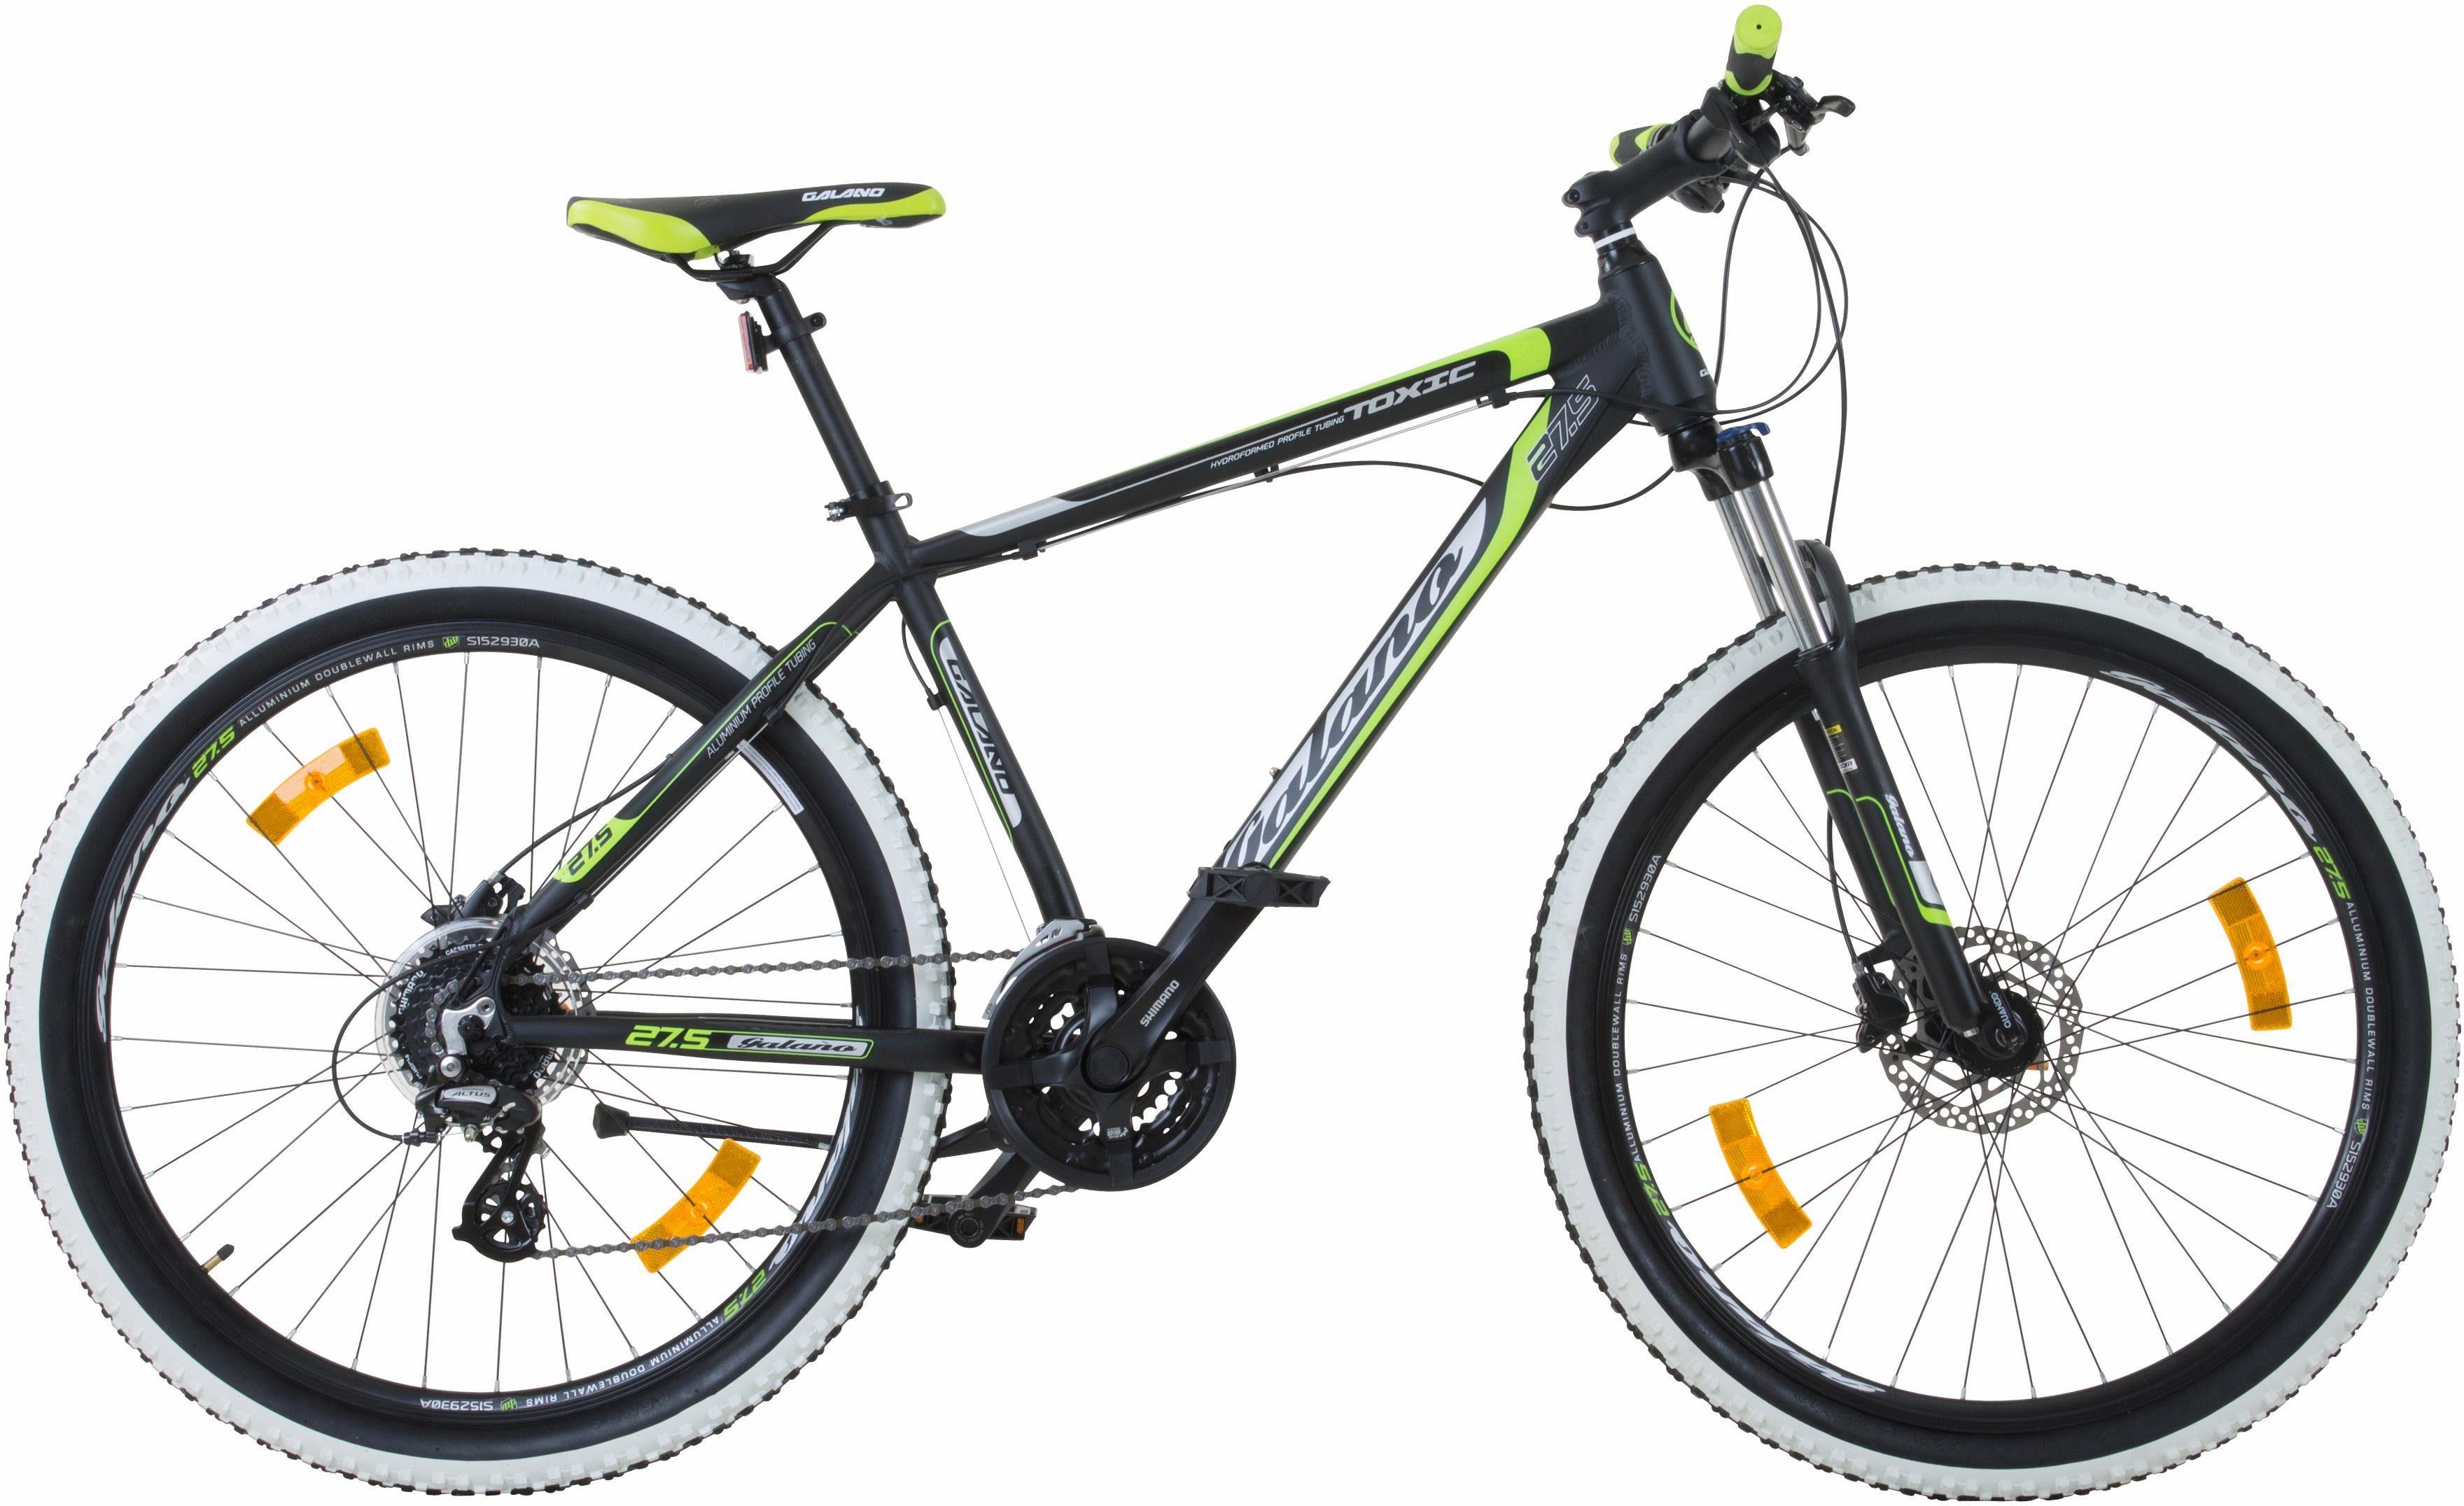 Galano Mountainbike »Toxic«, 21 Gang Shimano Shimano TX35GS 7-fach Schaltwerk, Kettenschaltung